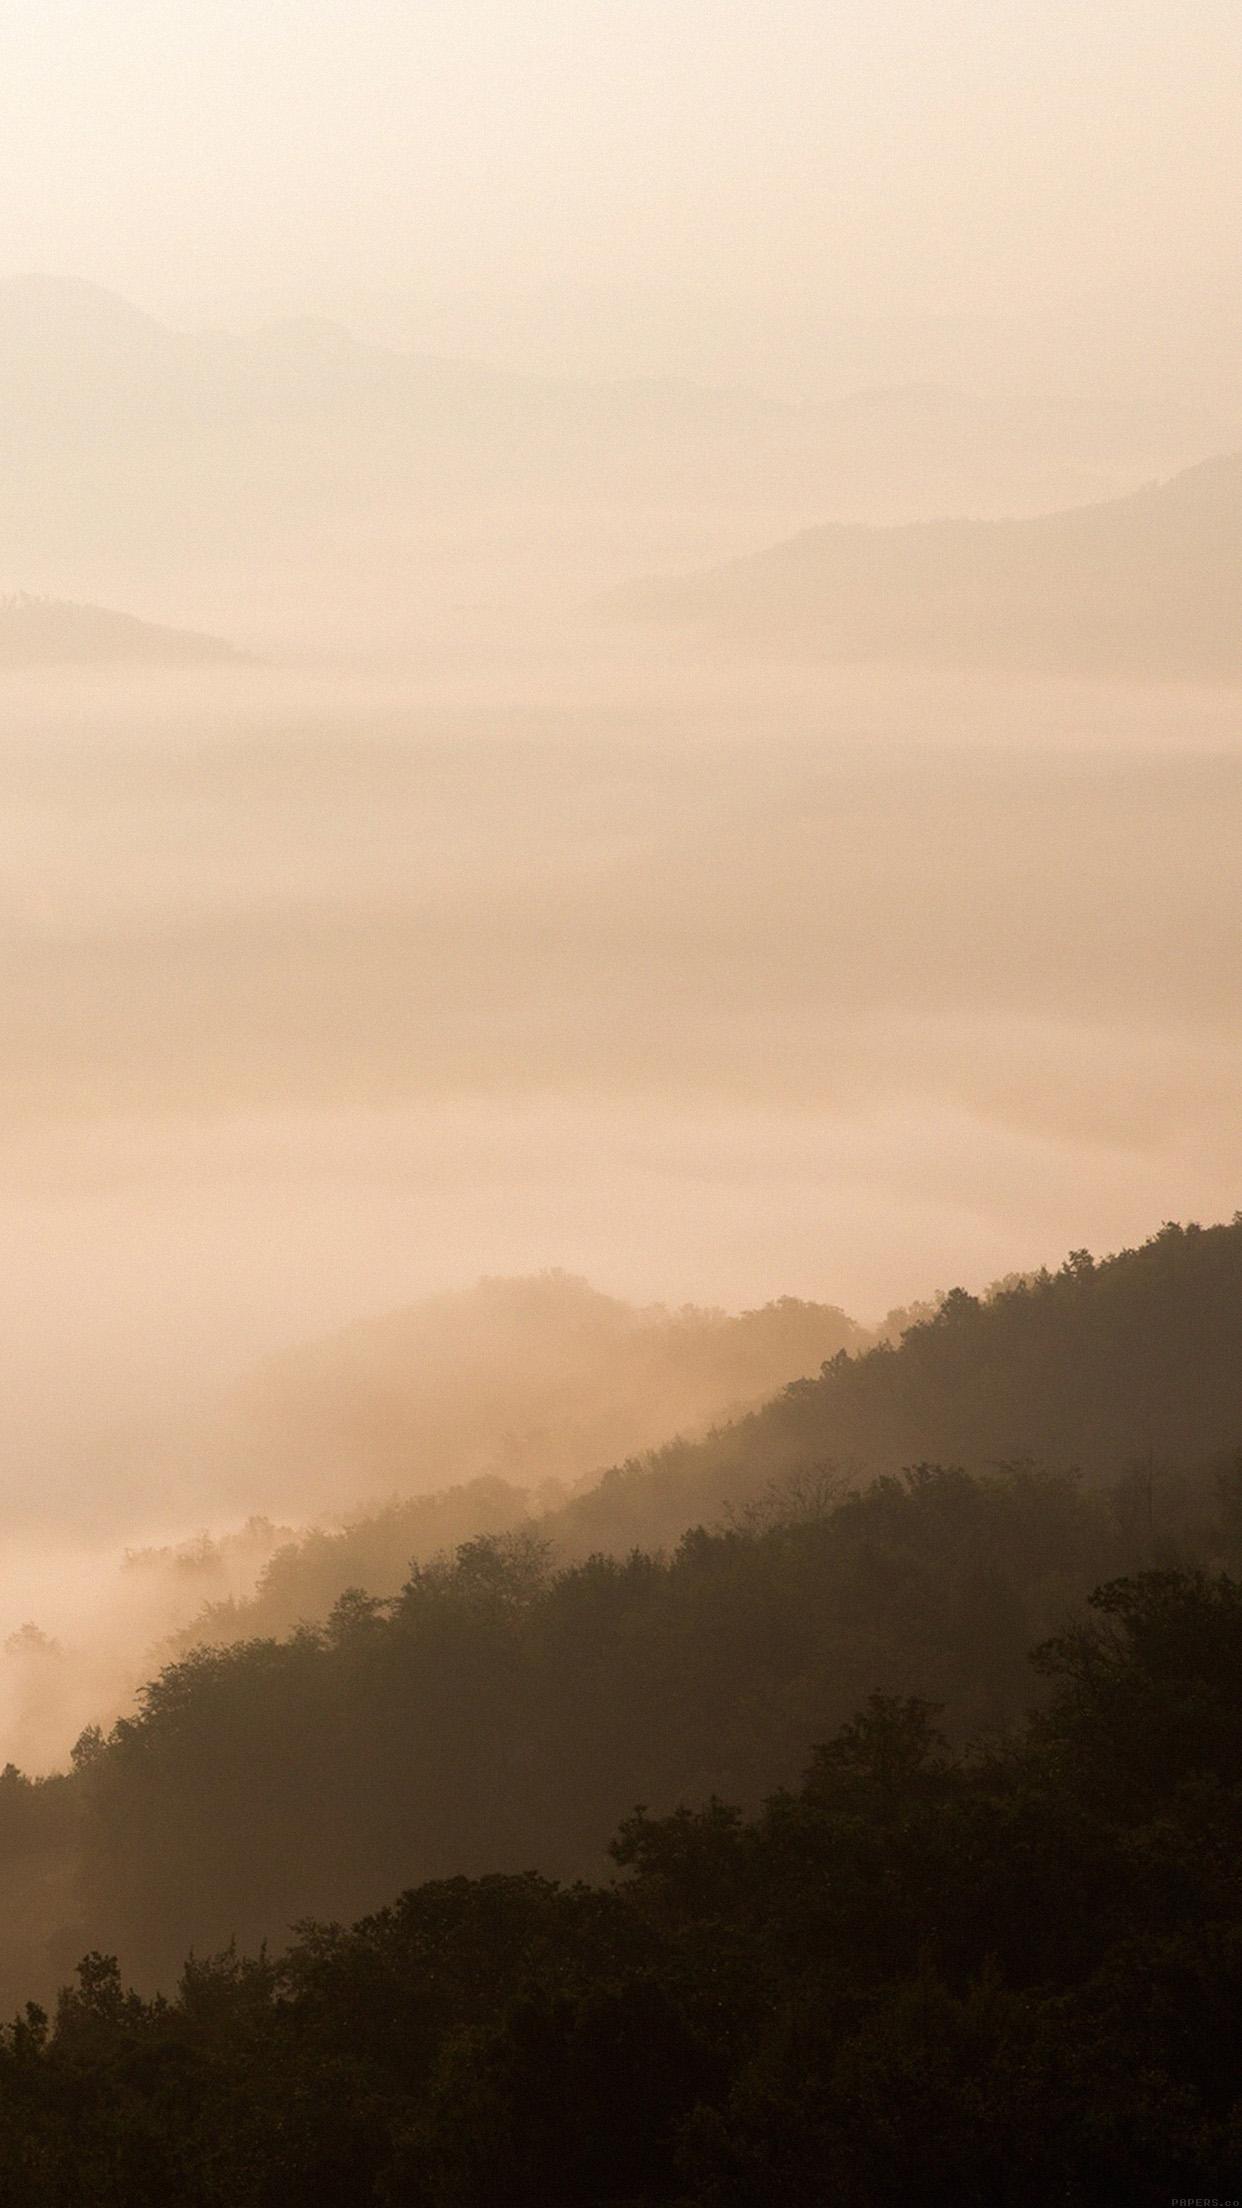 Must see Wallpaper Mountain Fog - Mountain-Fog-Yellow-Nature  Photograph_481488.jpg